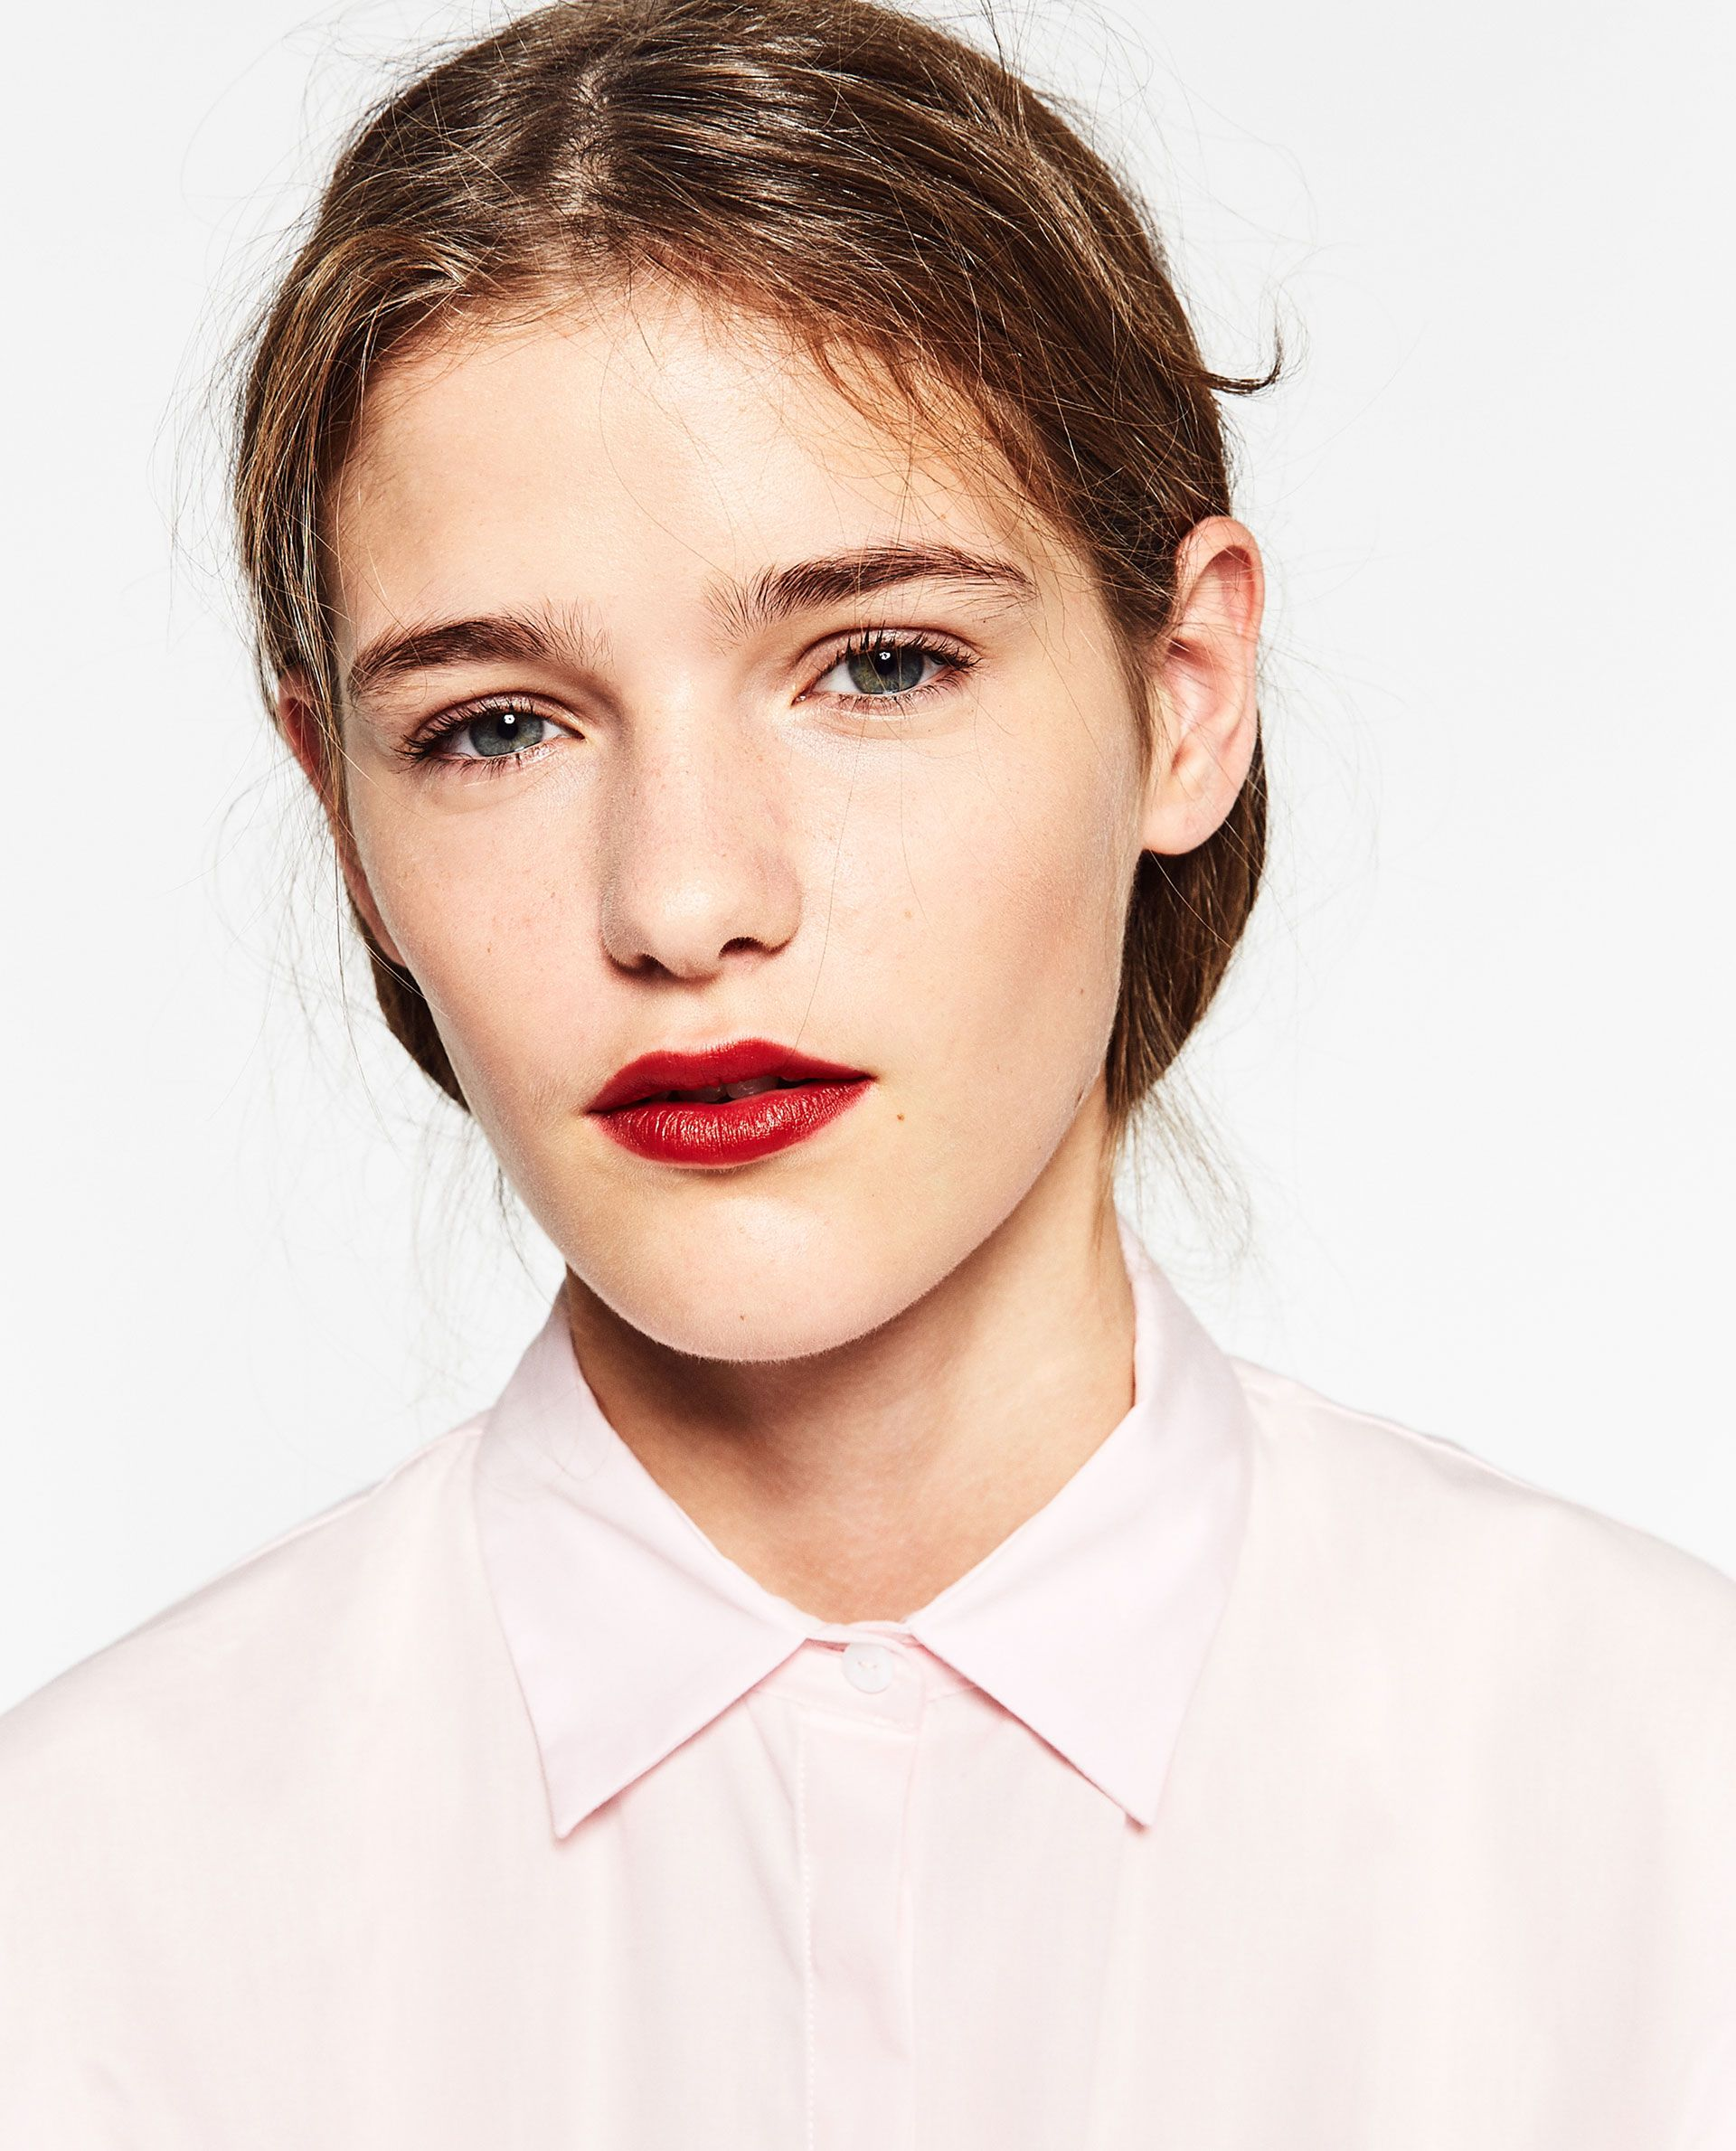 ОБЪЕМНАЯ РУБАШКА Makeup looks, Beaut, Minimal makeup